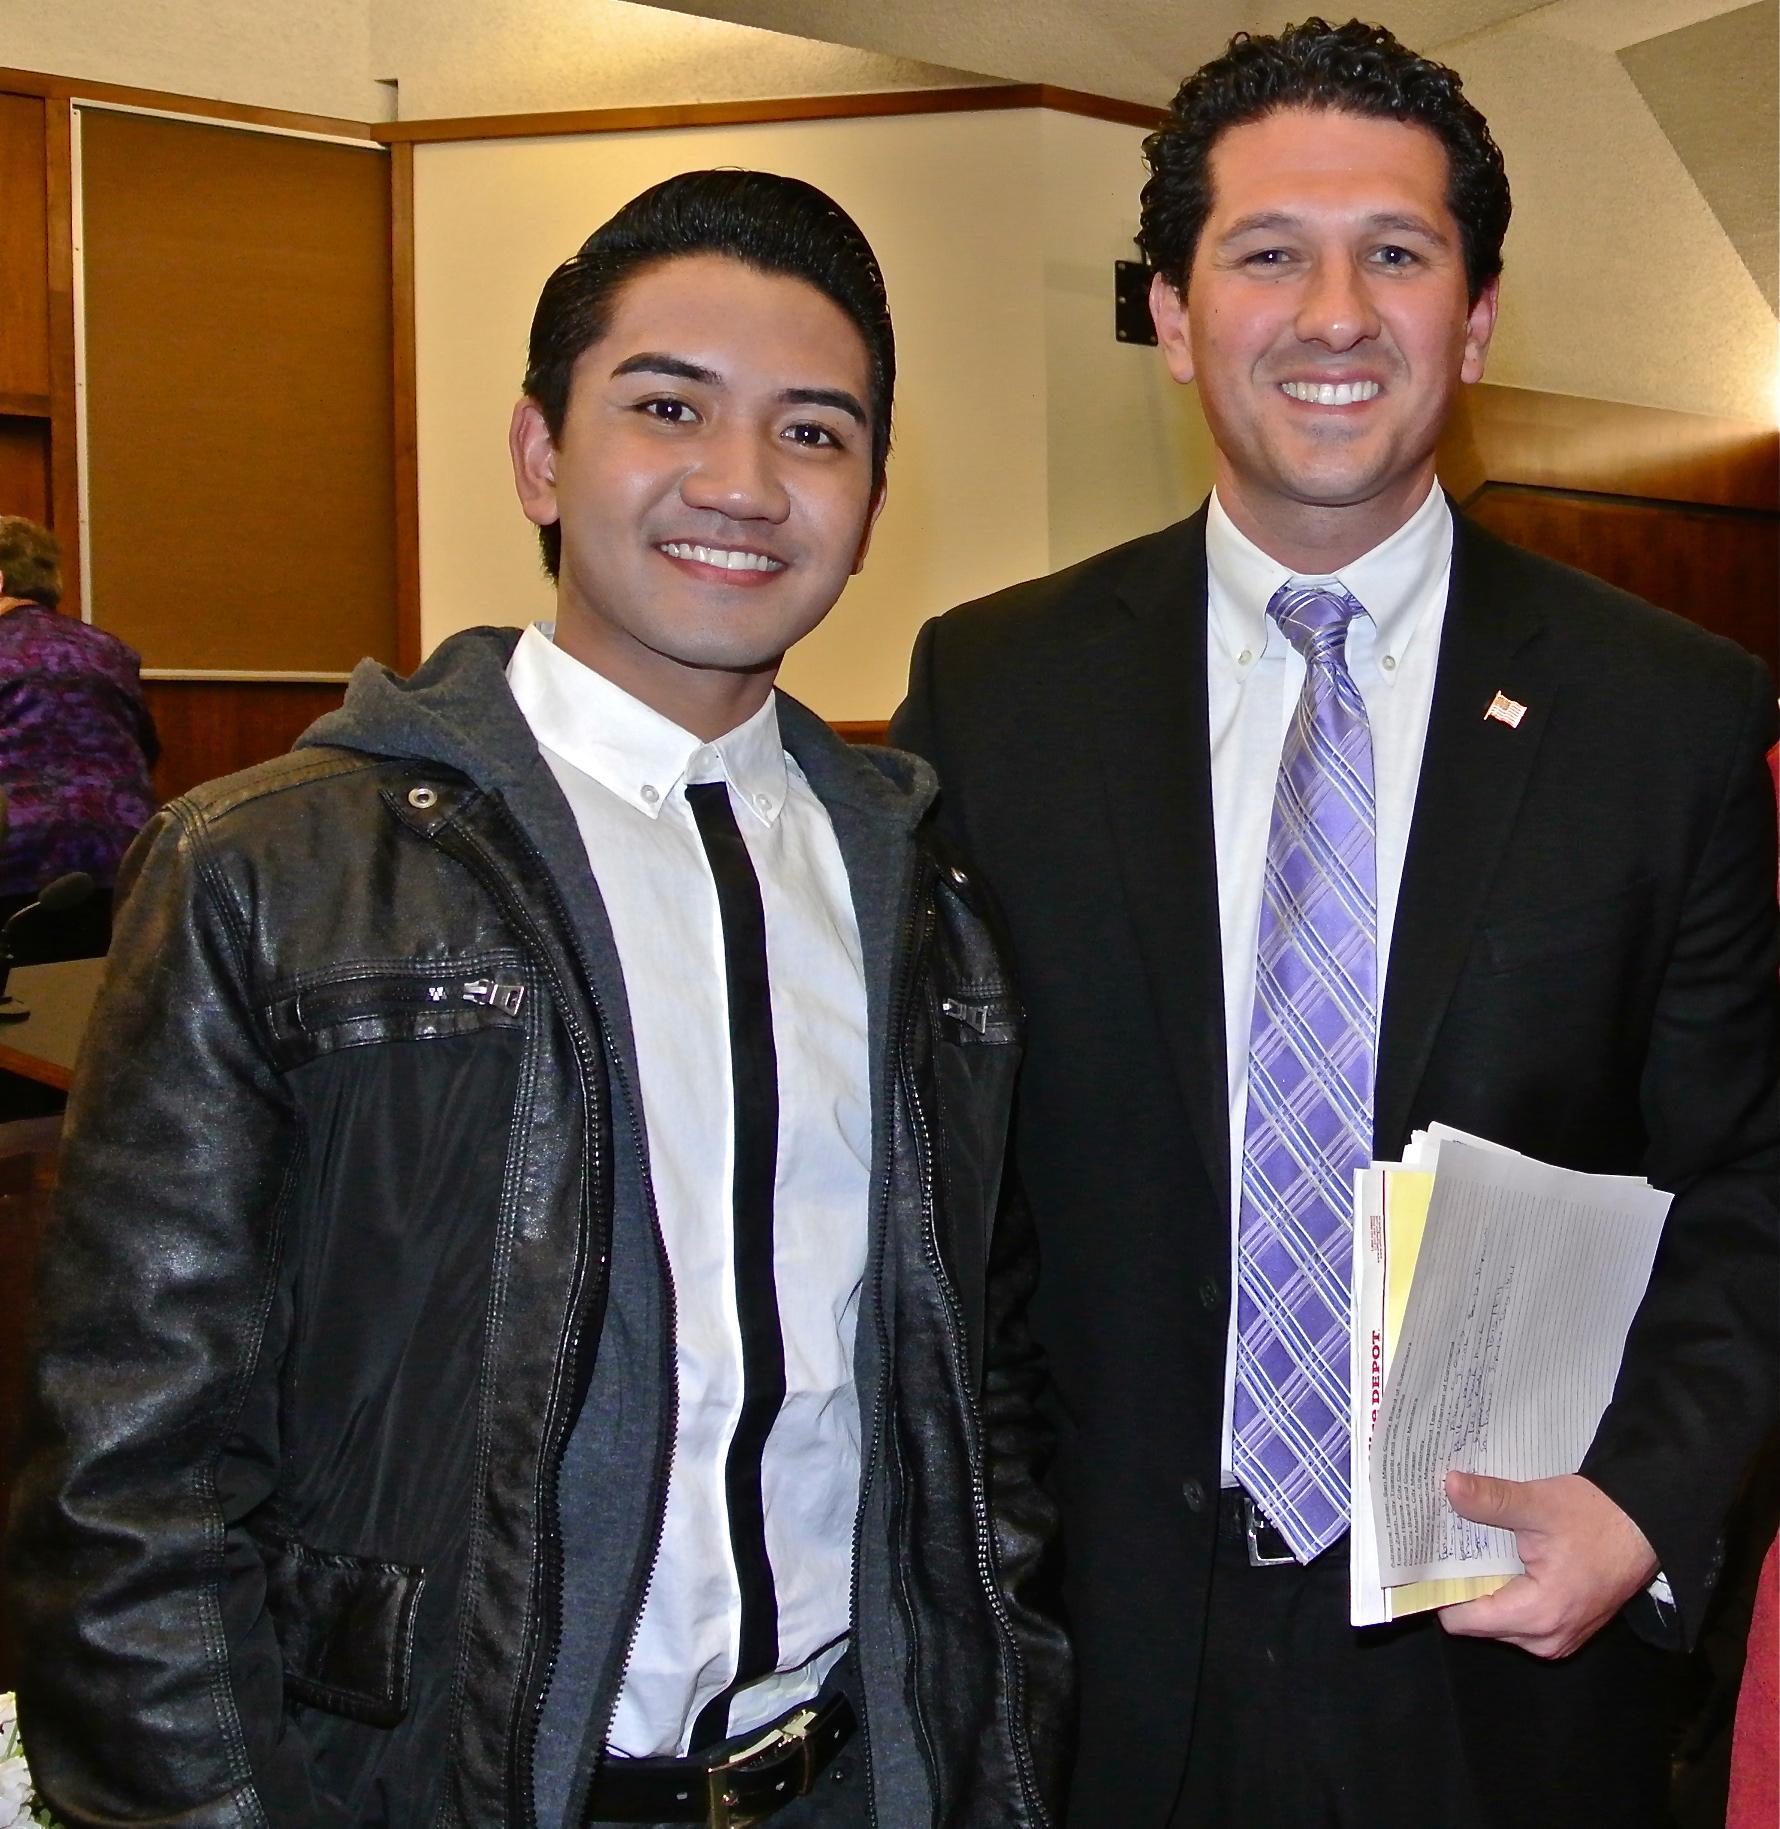 Mayor of Daly City - Dave Canepa